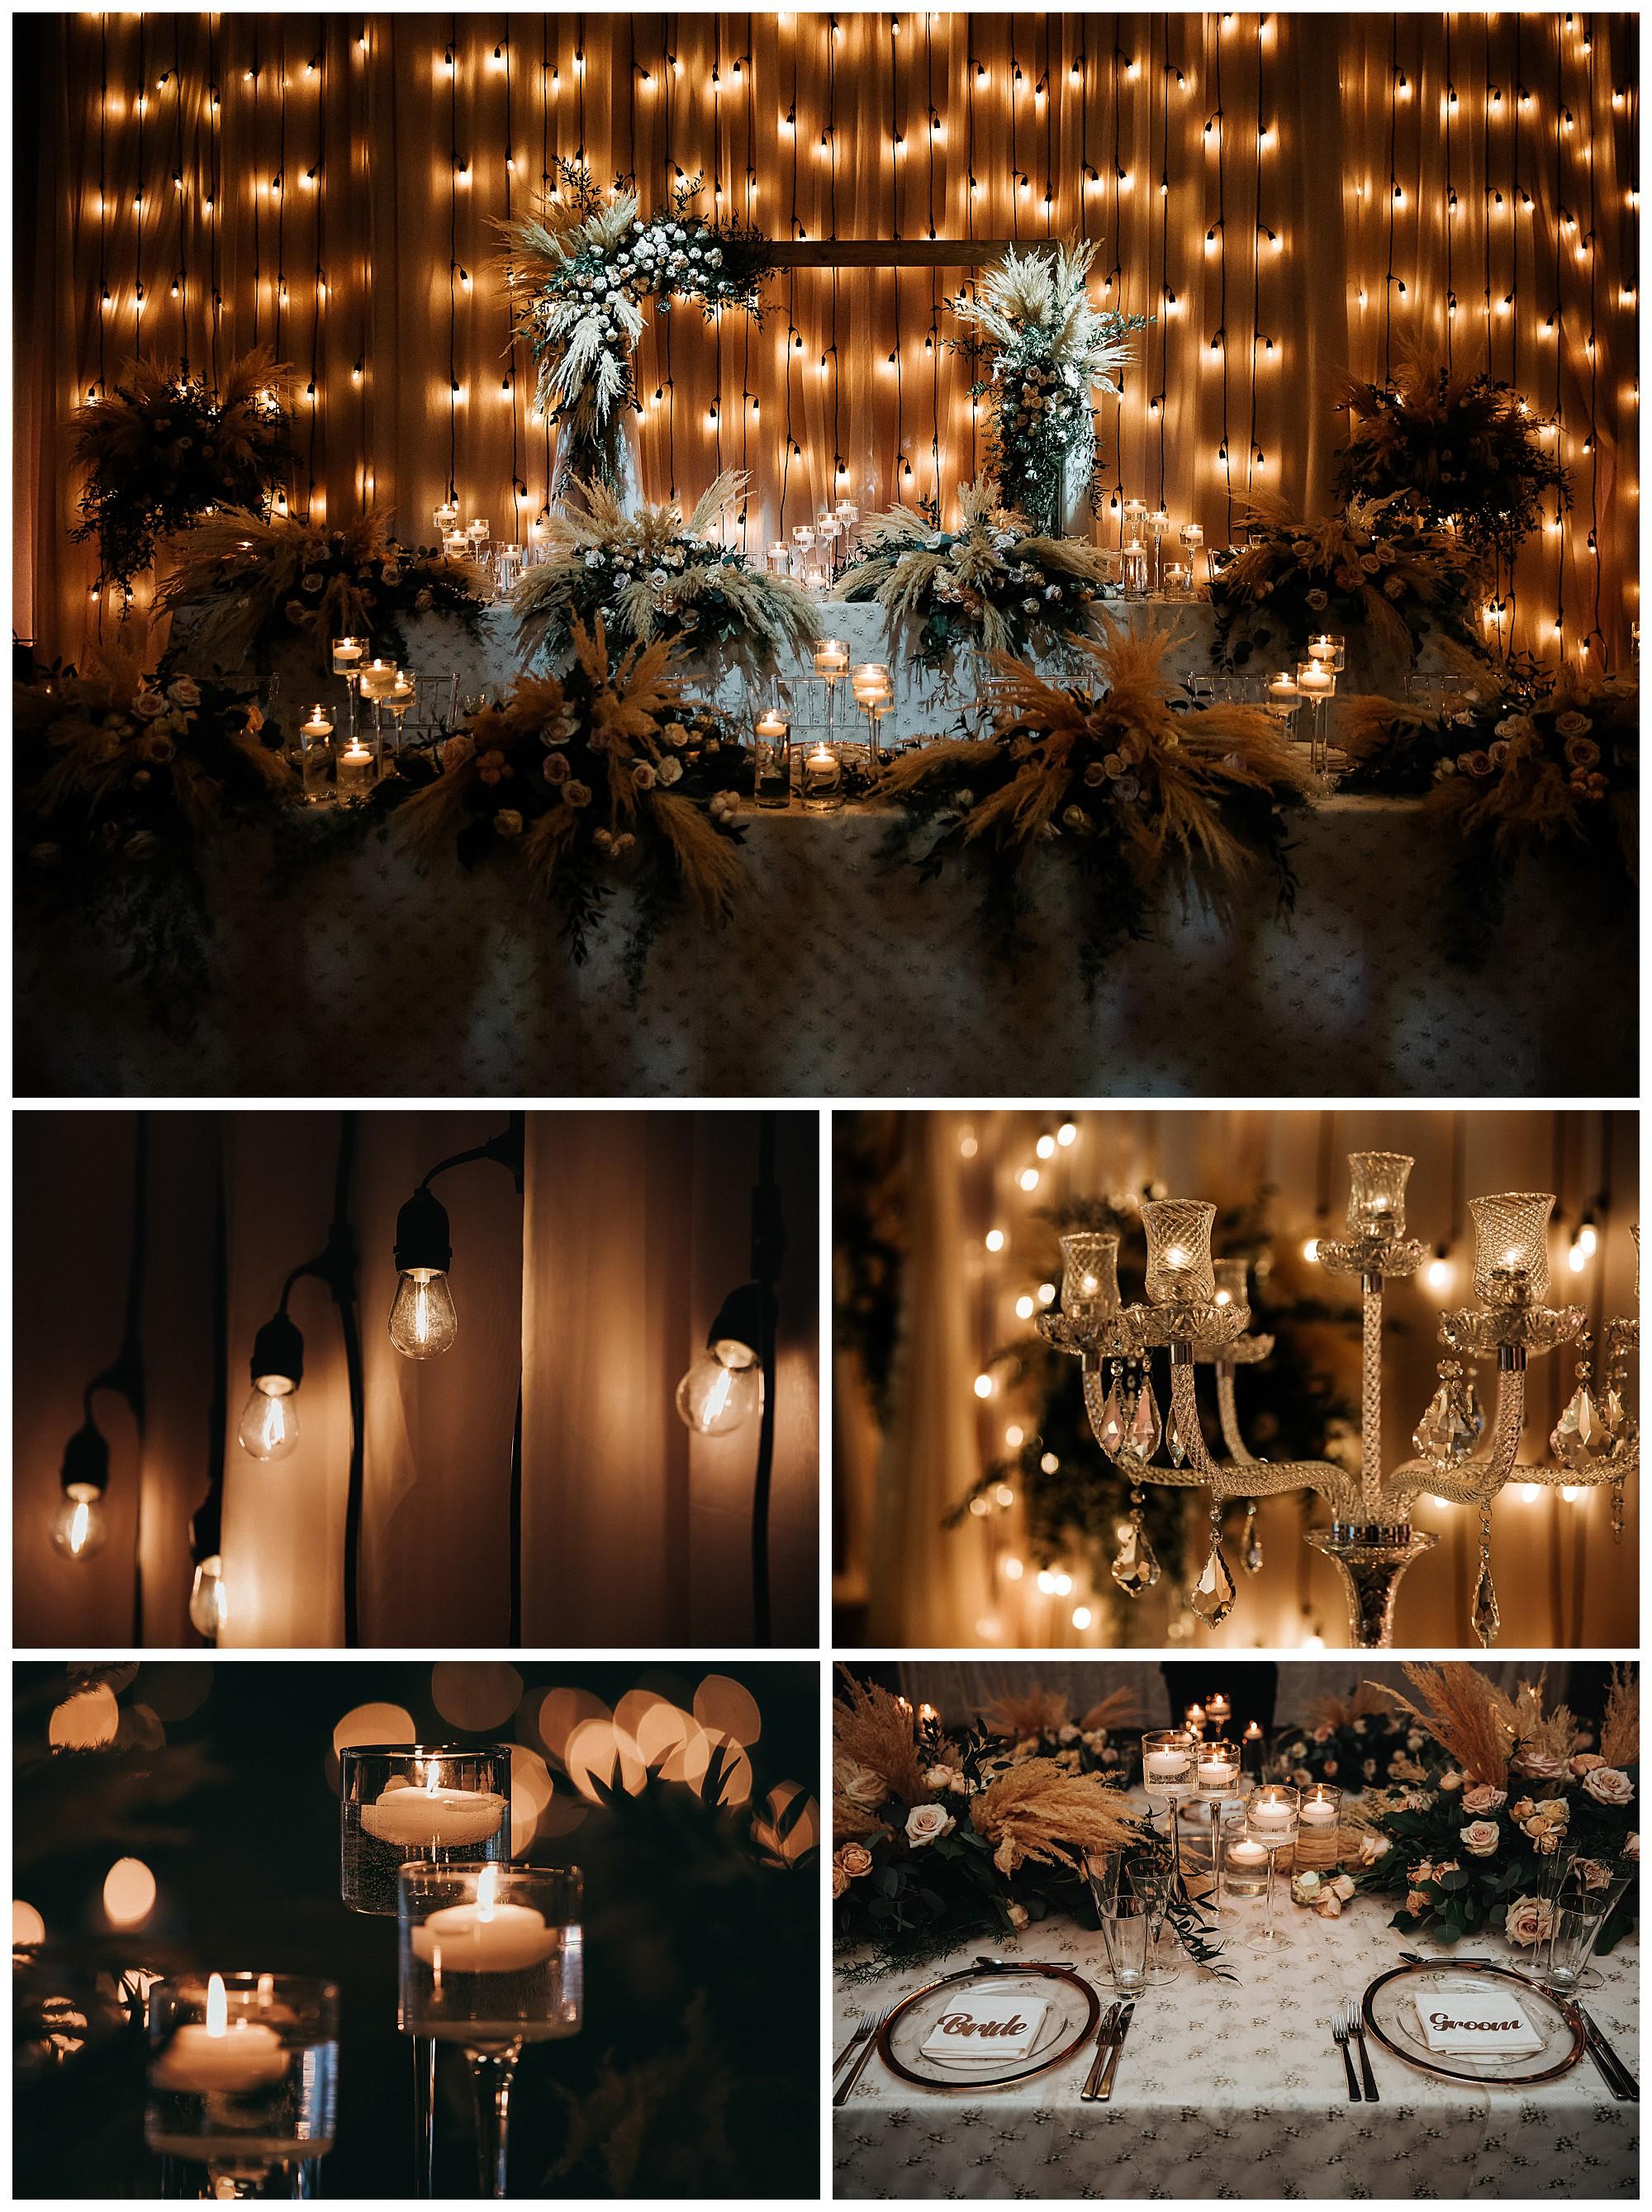 Joanna-Christos-Grand-Luxe-Wedding-Photos-Mint-Room-Toronto-VanDaele-Russell_0095.jpg